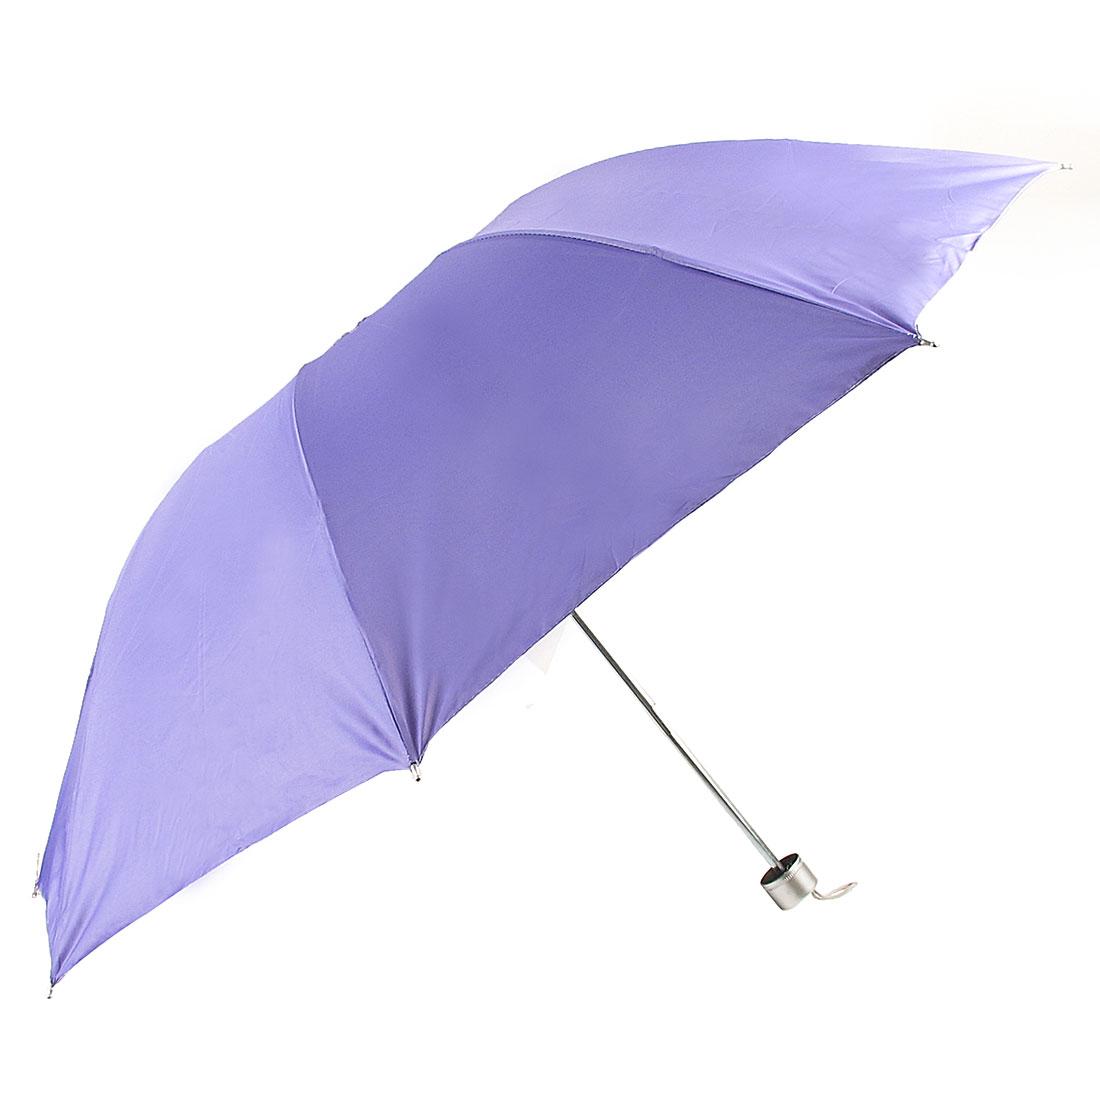 Portable Metallic Shaft Foldable Sun Umbrella Parasol Light Purple